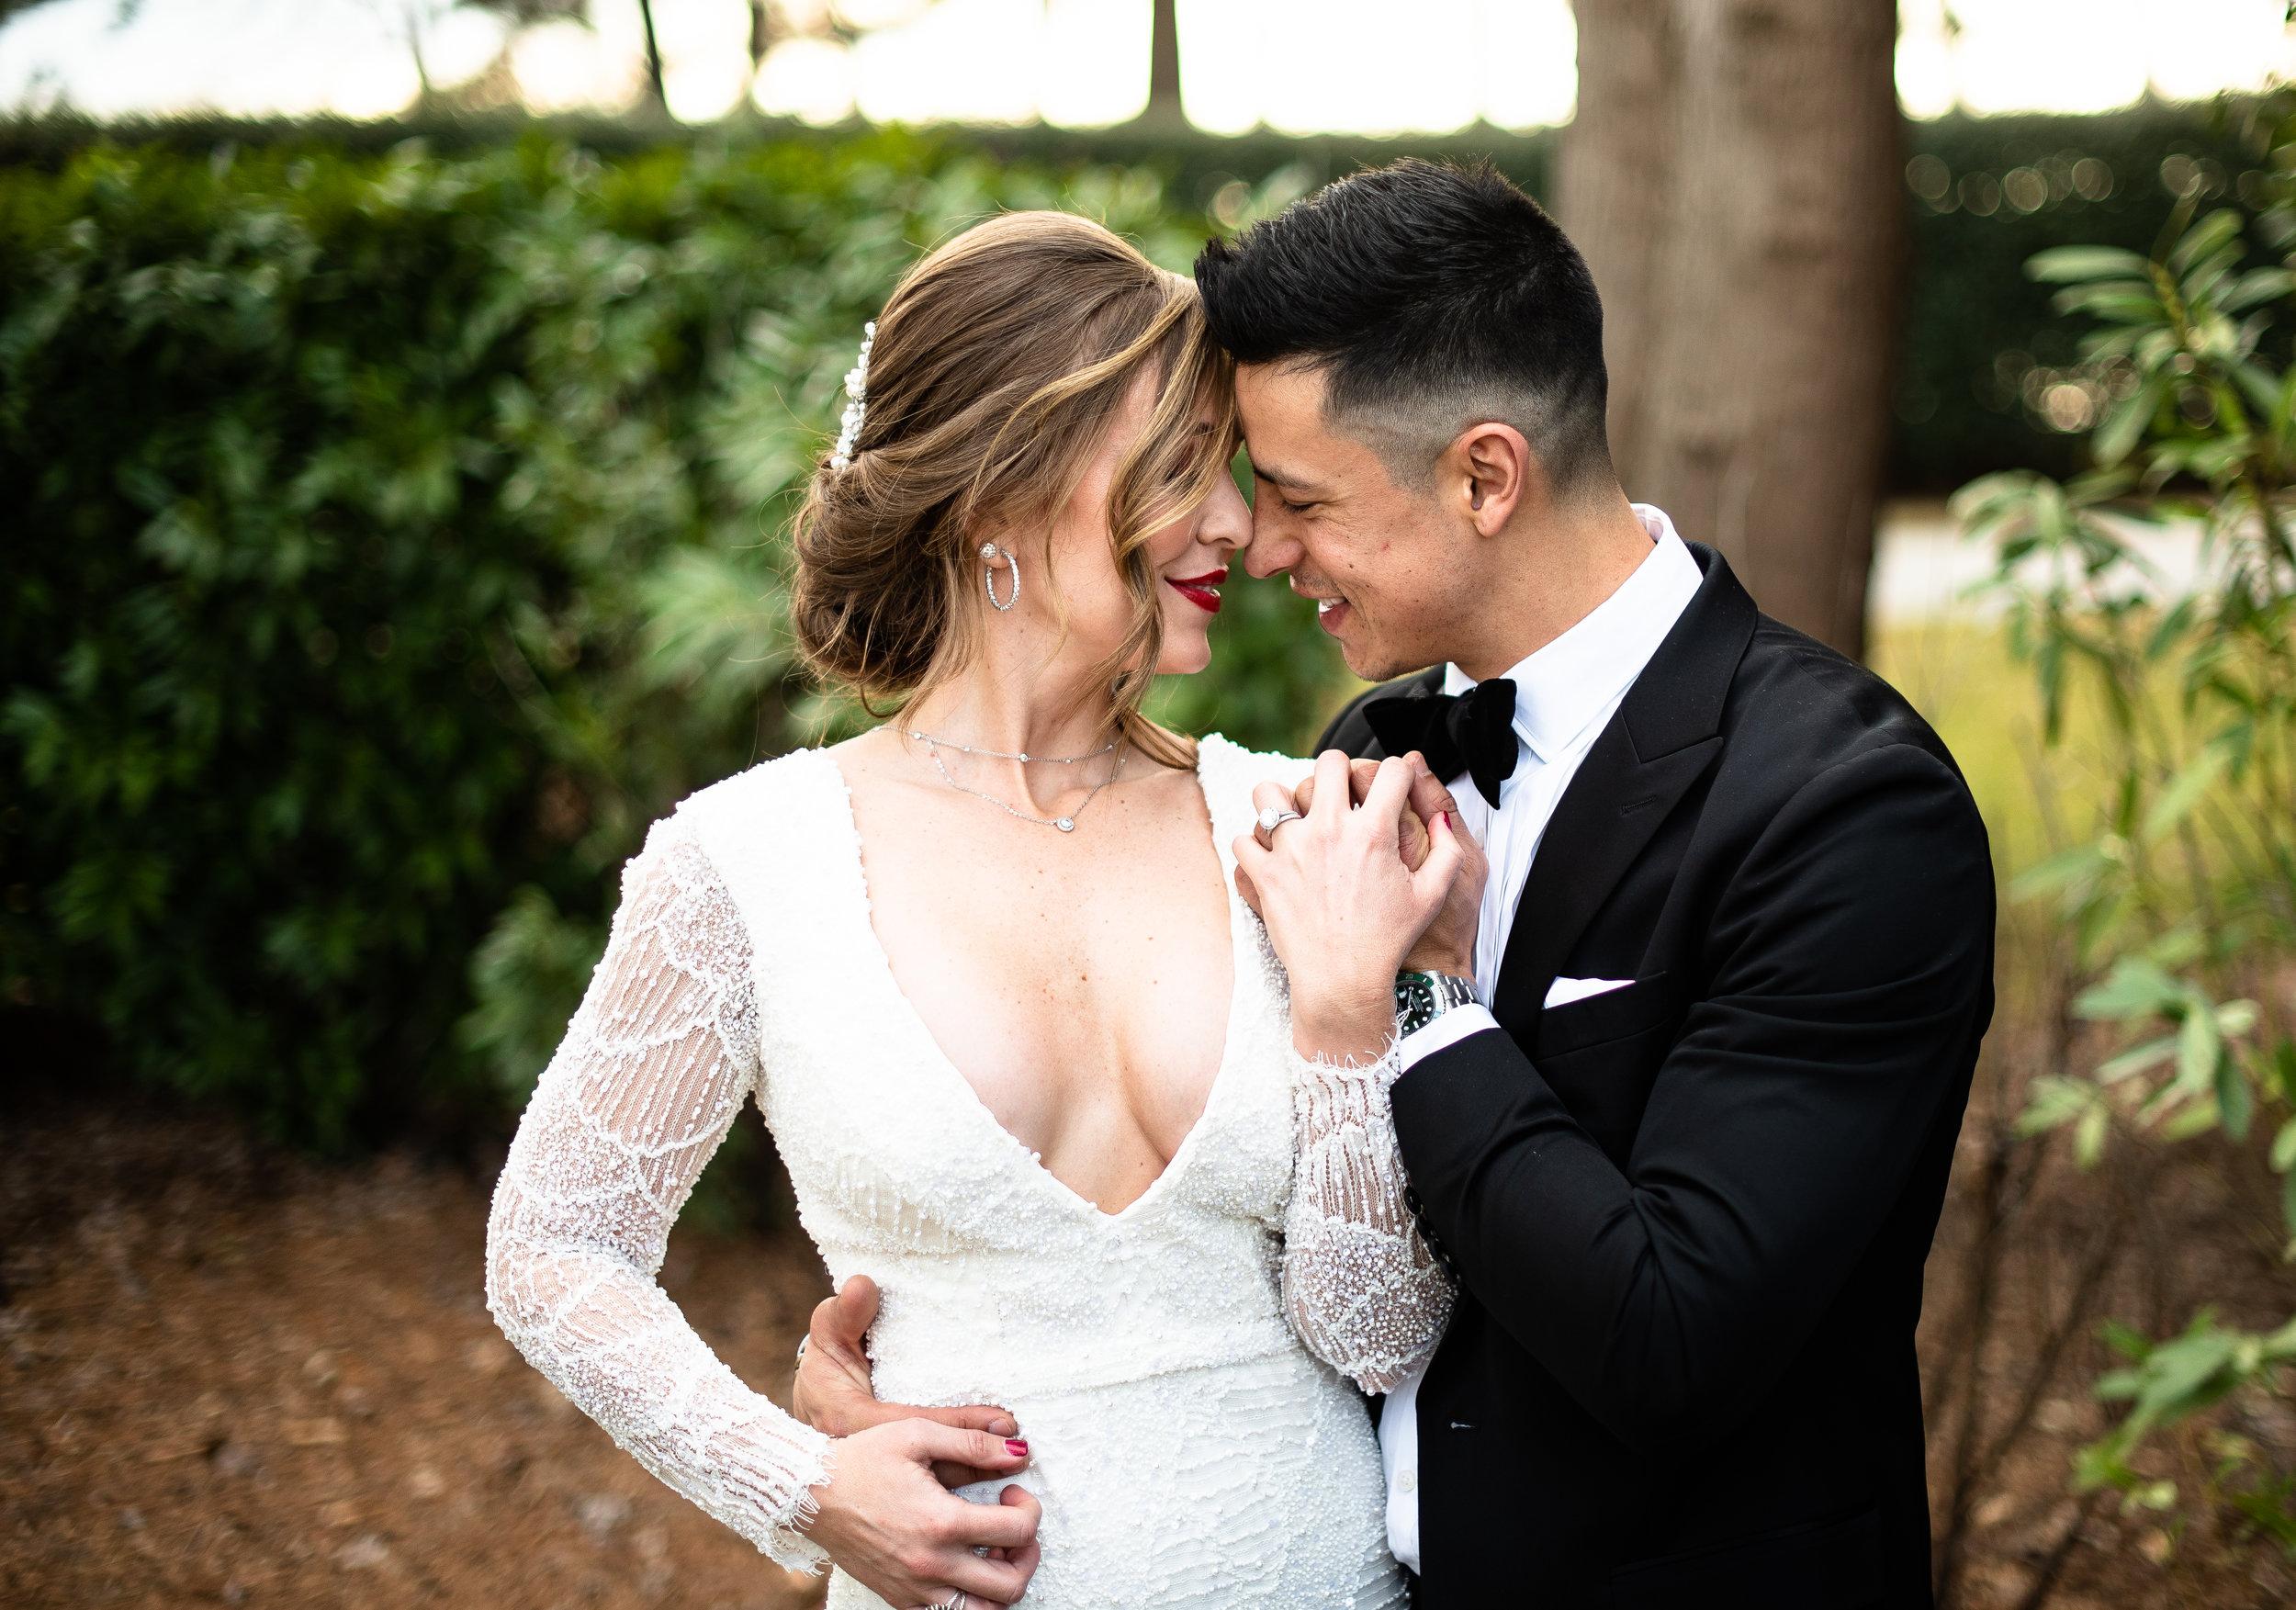 High Point Wedding Photographer - NC Weddings - Yasmin Leonard Photography-5.jpg